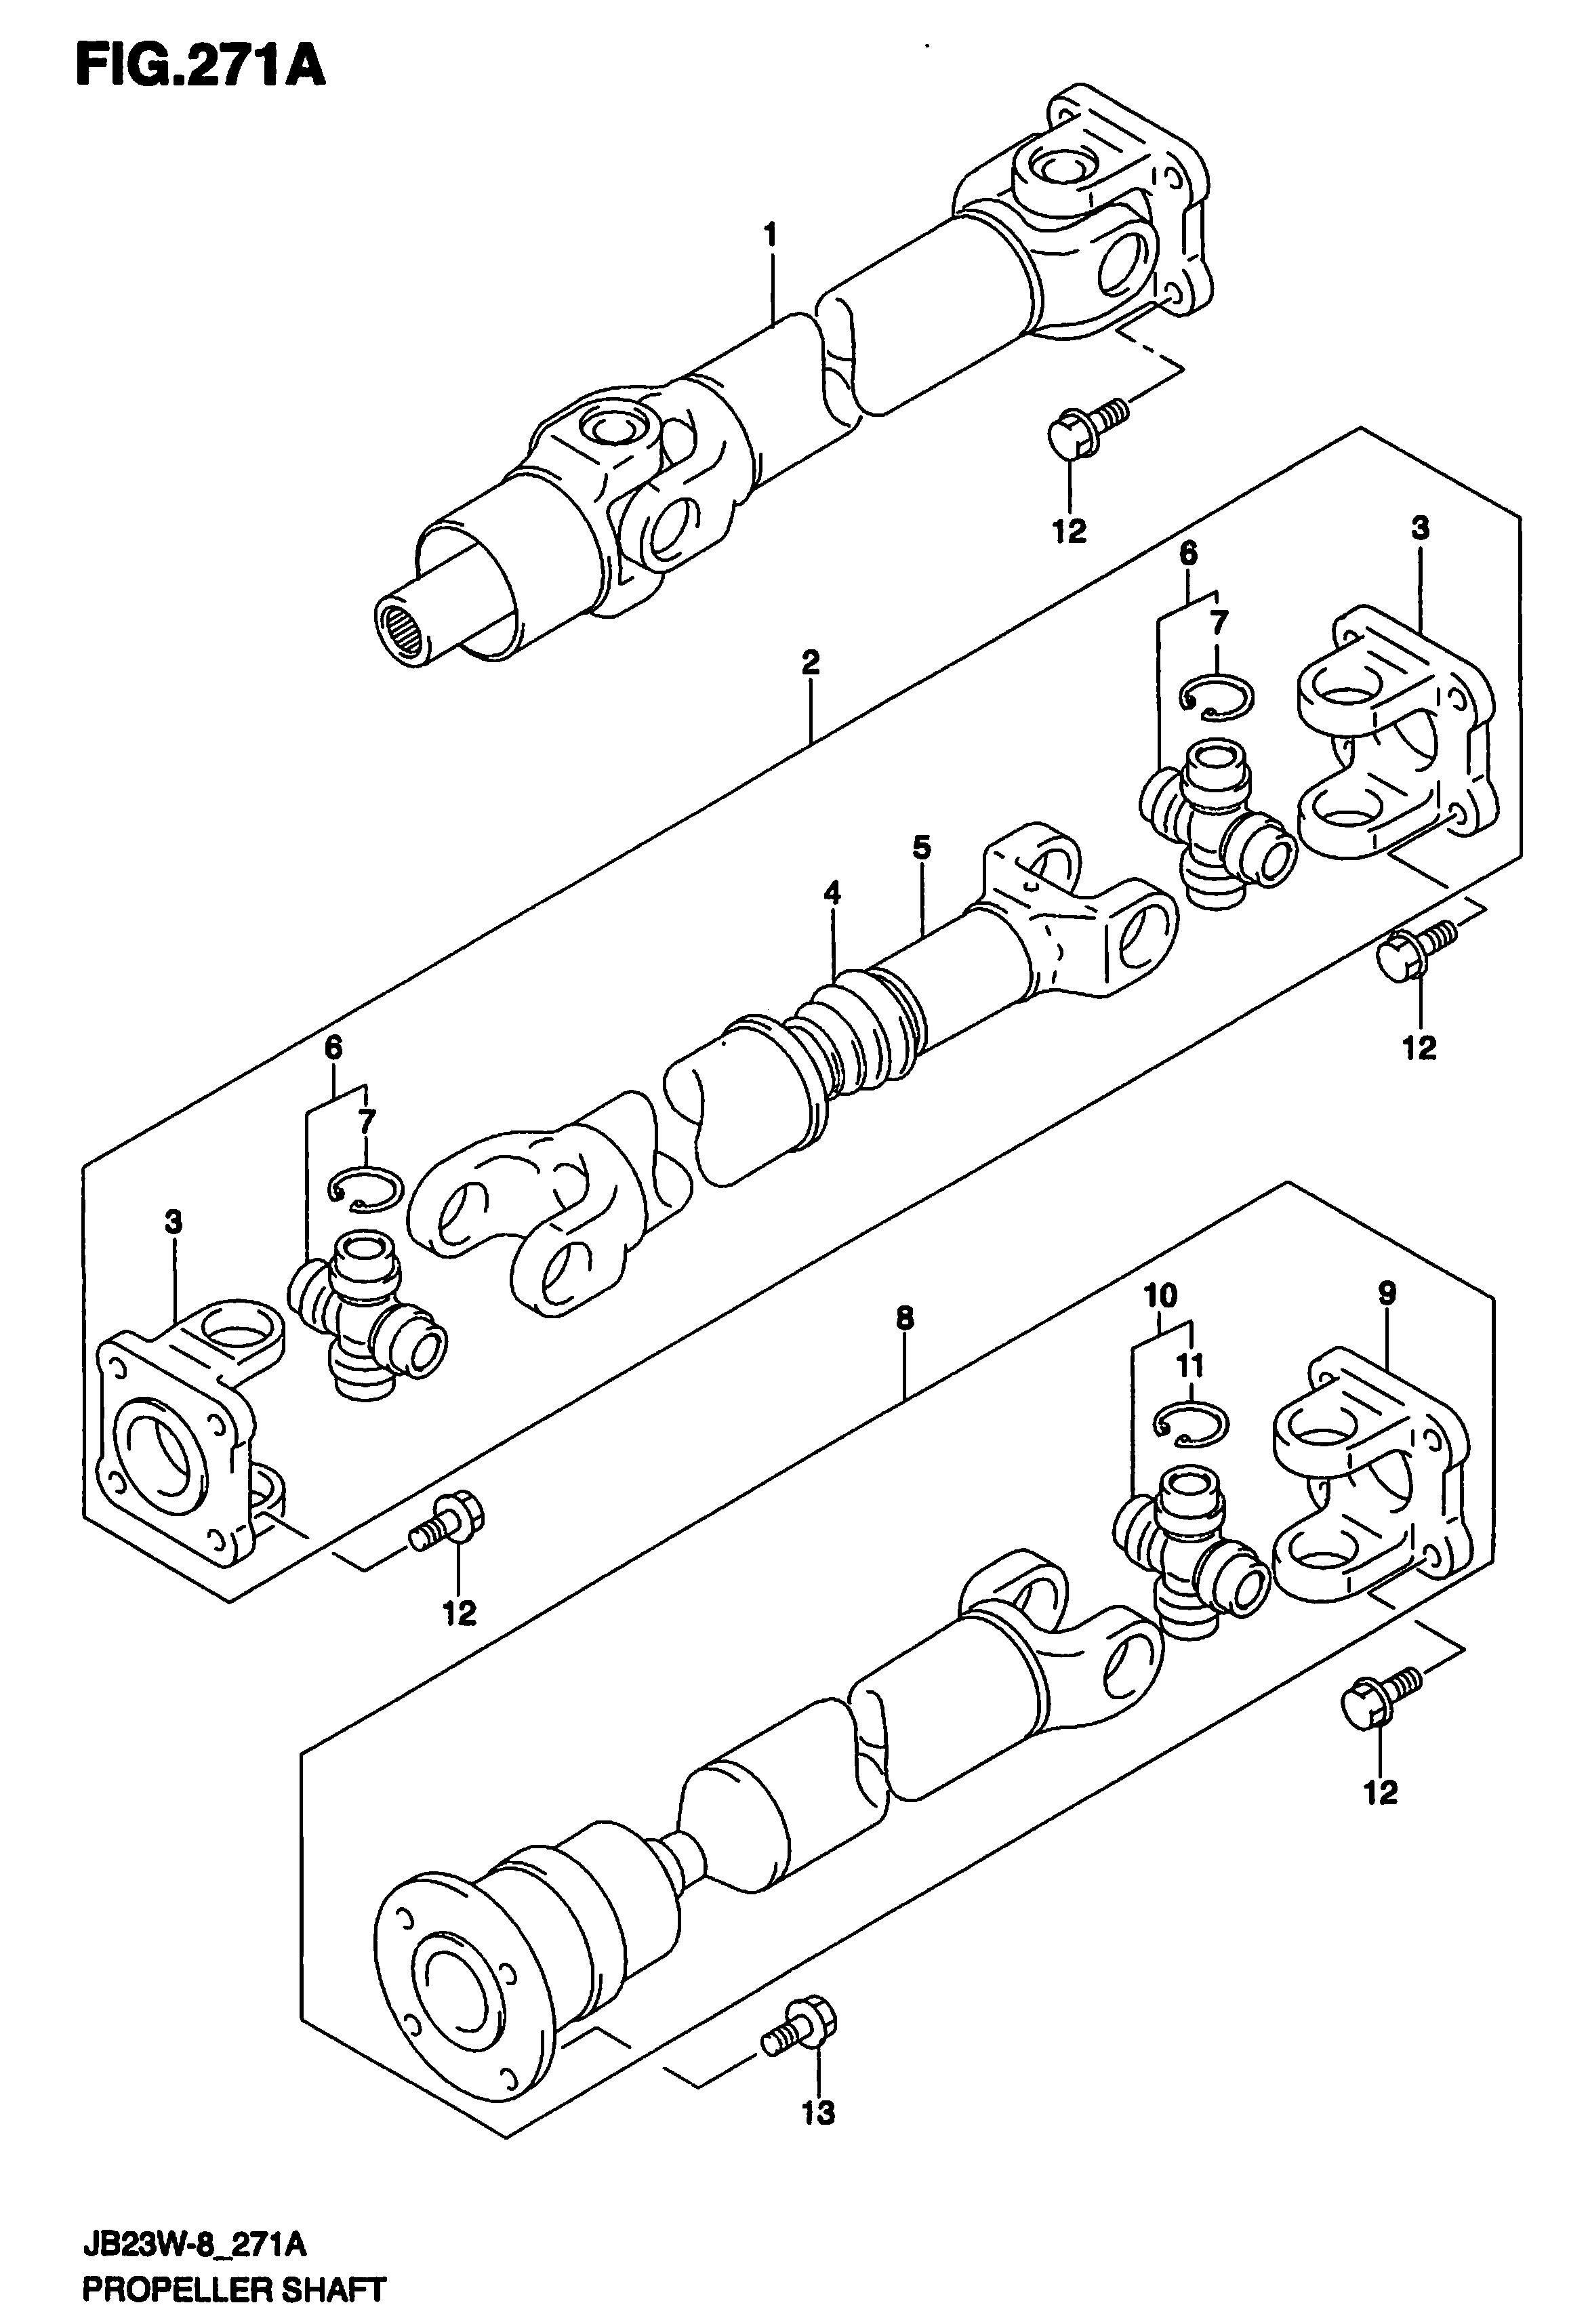 2016-5-24-2